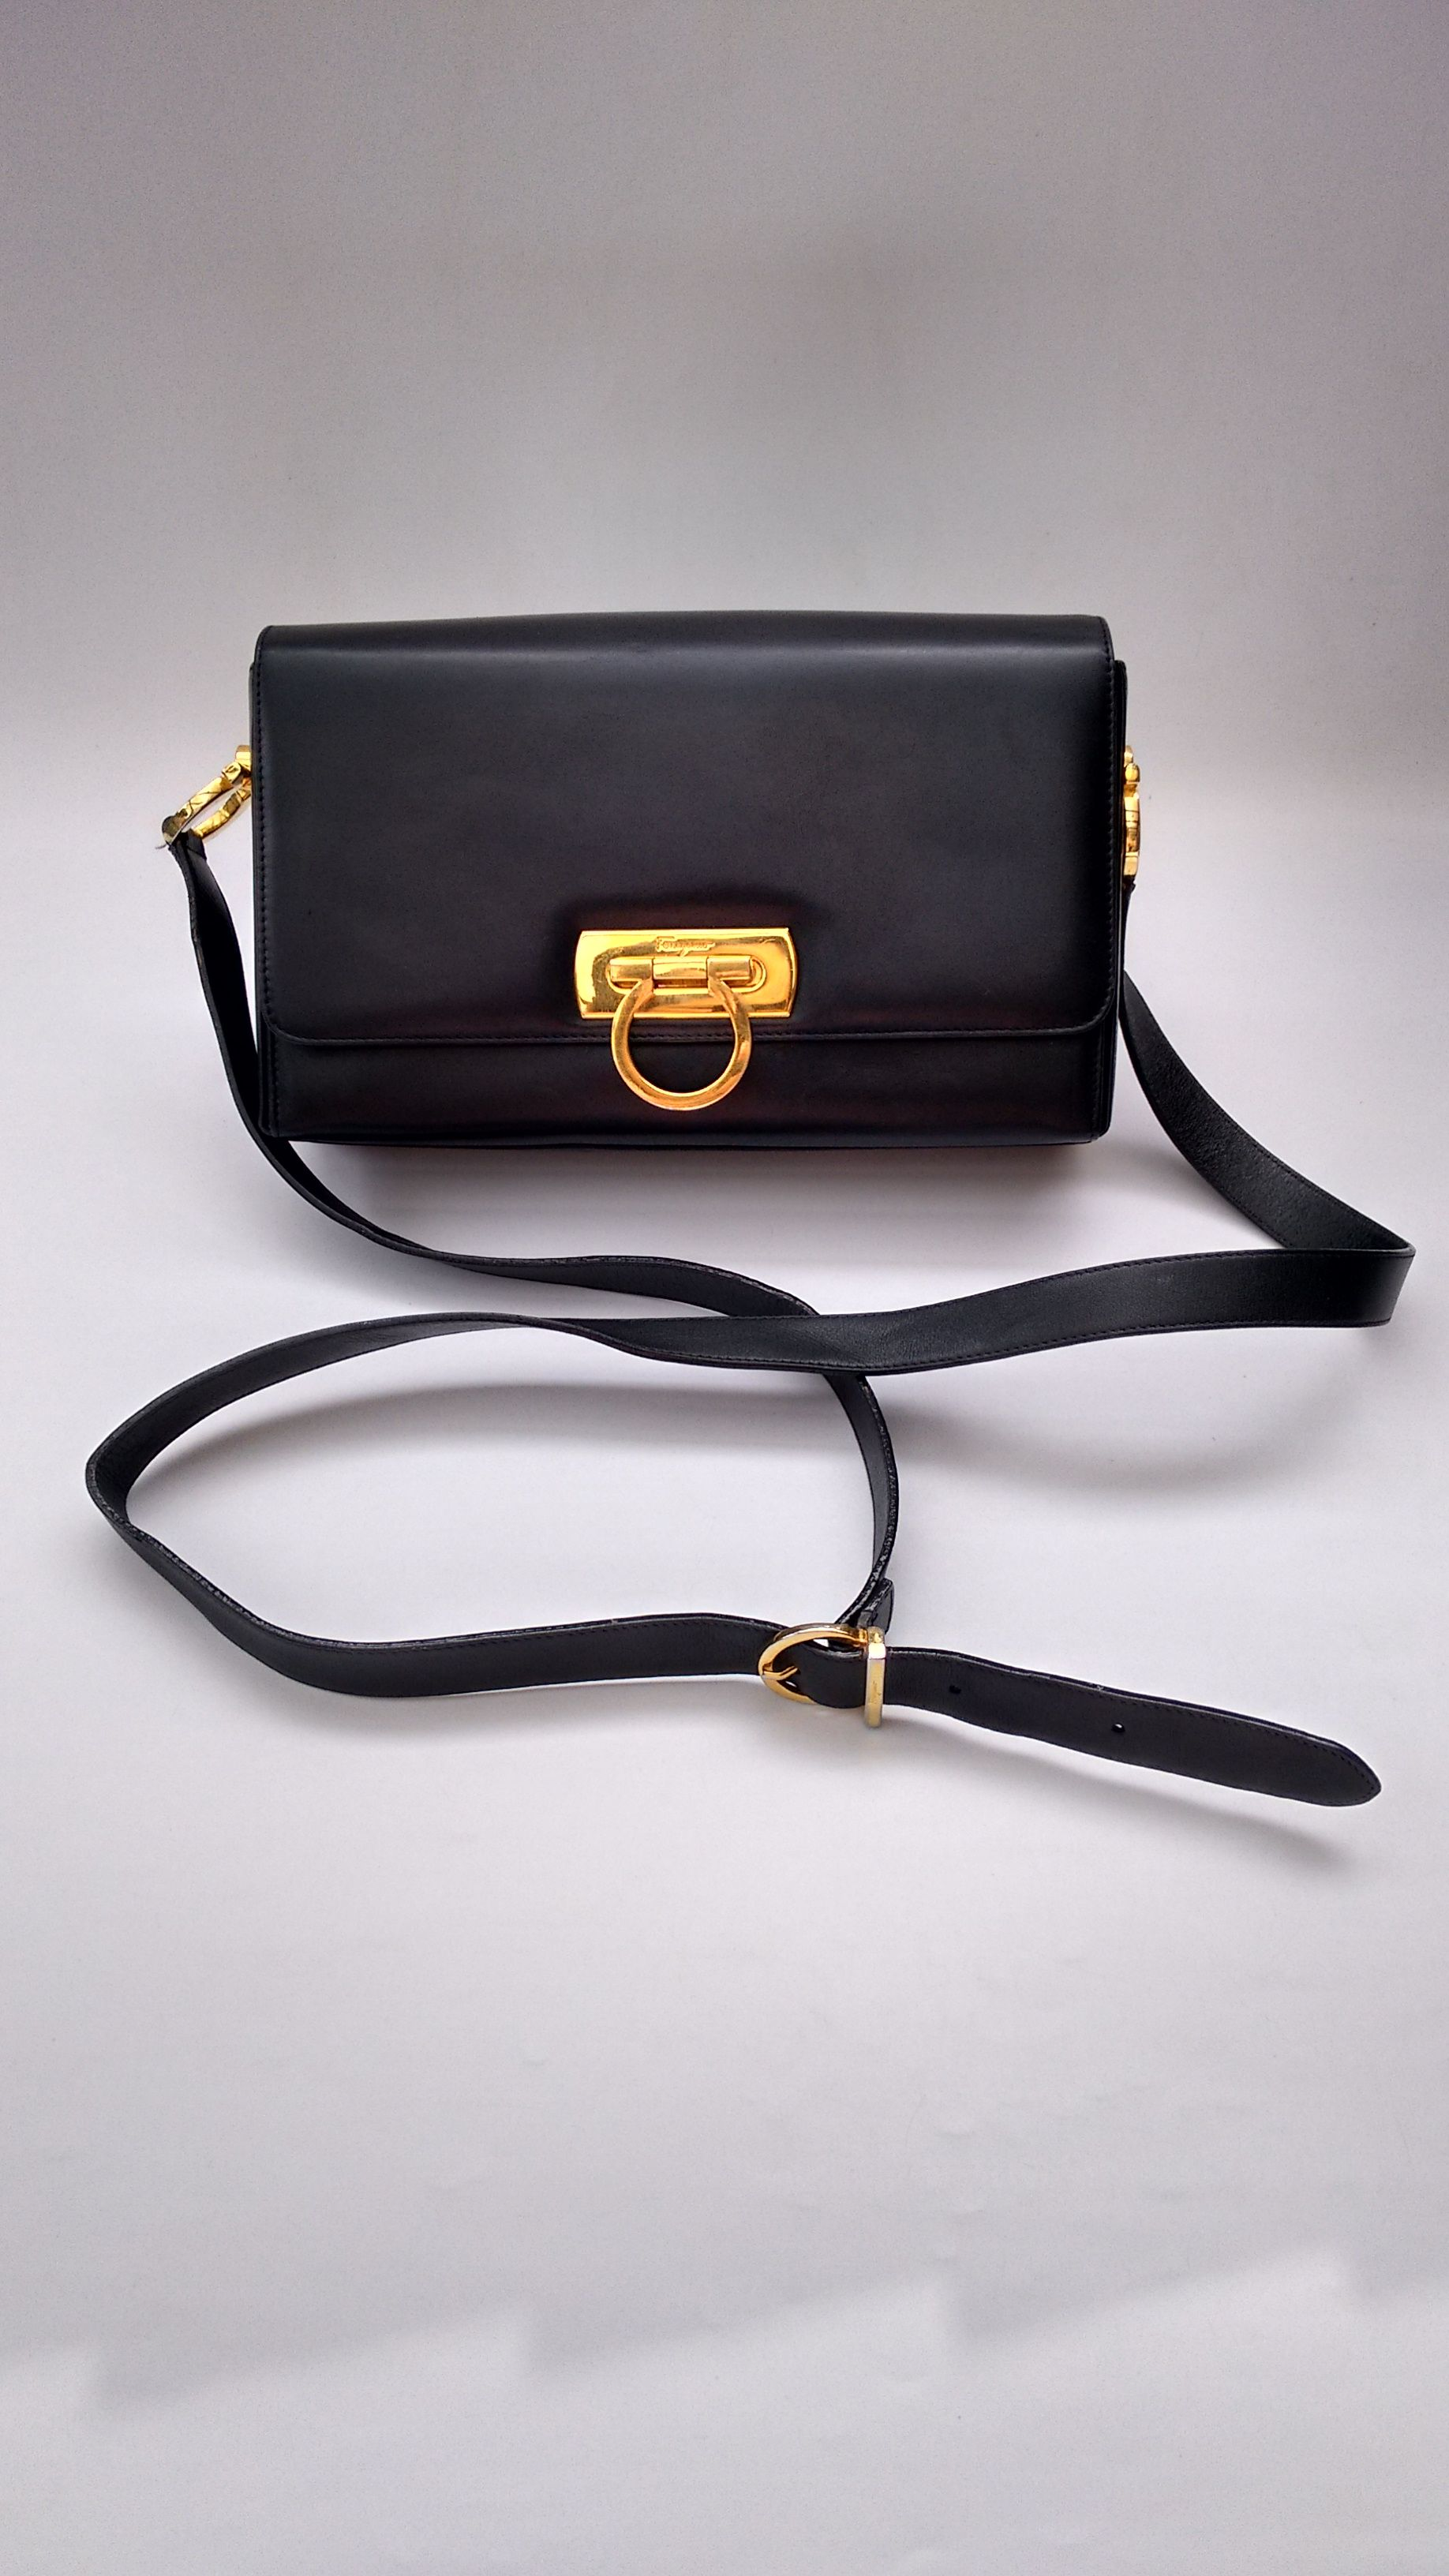 f99383b56c FERRAGAMO Bag. Salvatore Ferragamo Vintage Gancini Navy   Dark Blue Leather  Shoulder   Crossbody Bag. Italian designer purse.